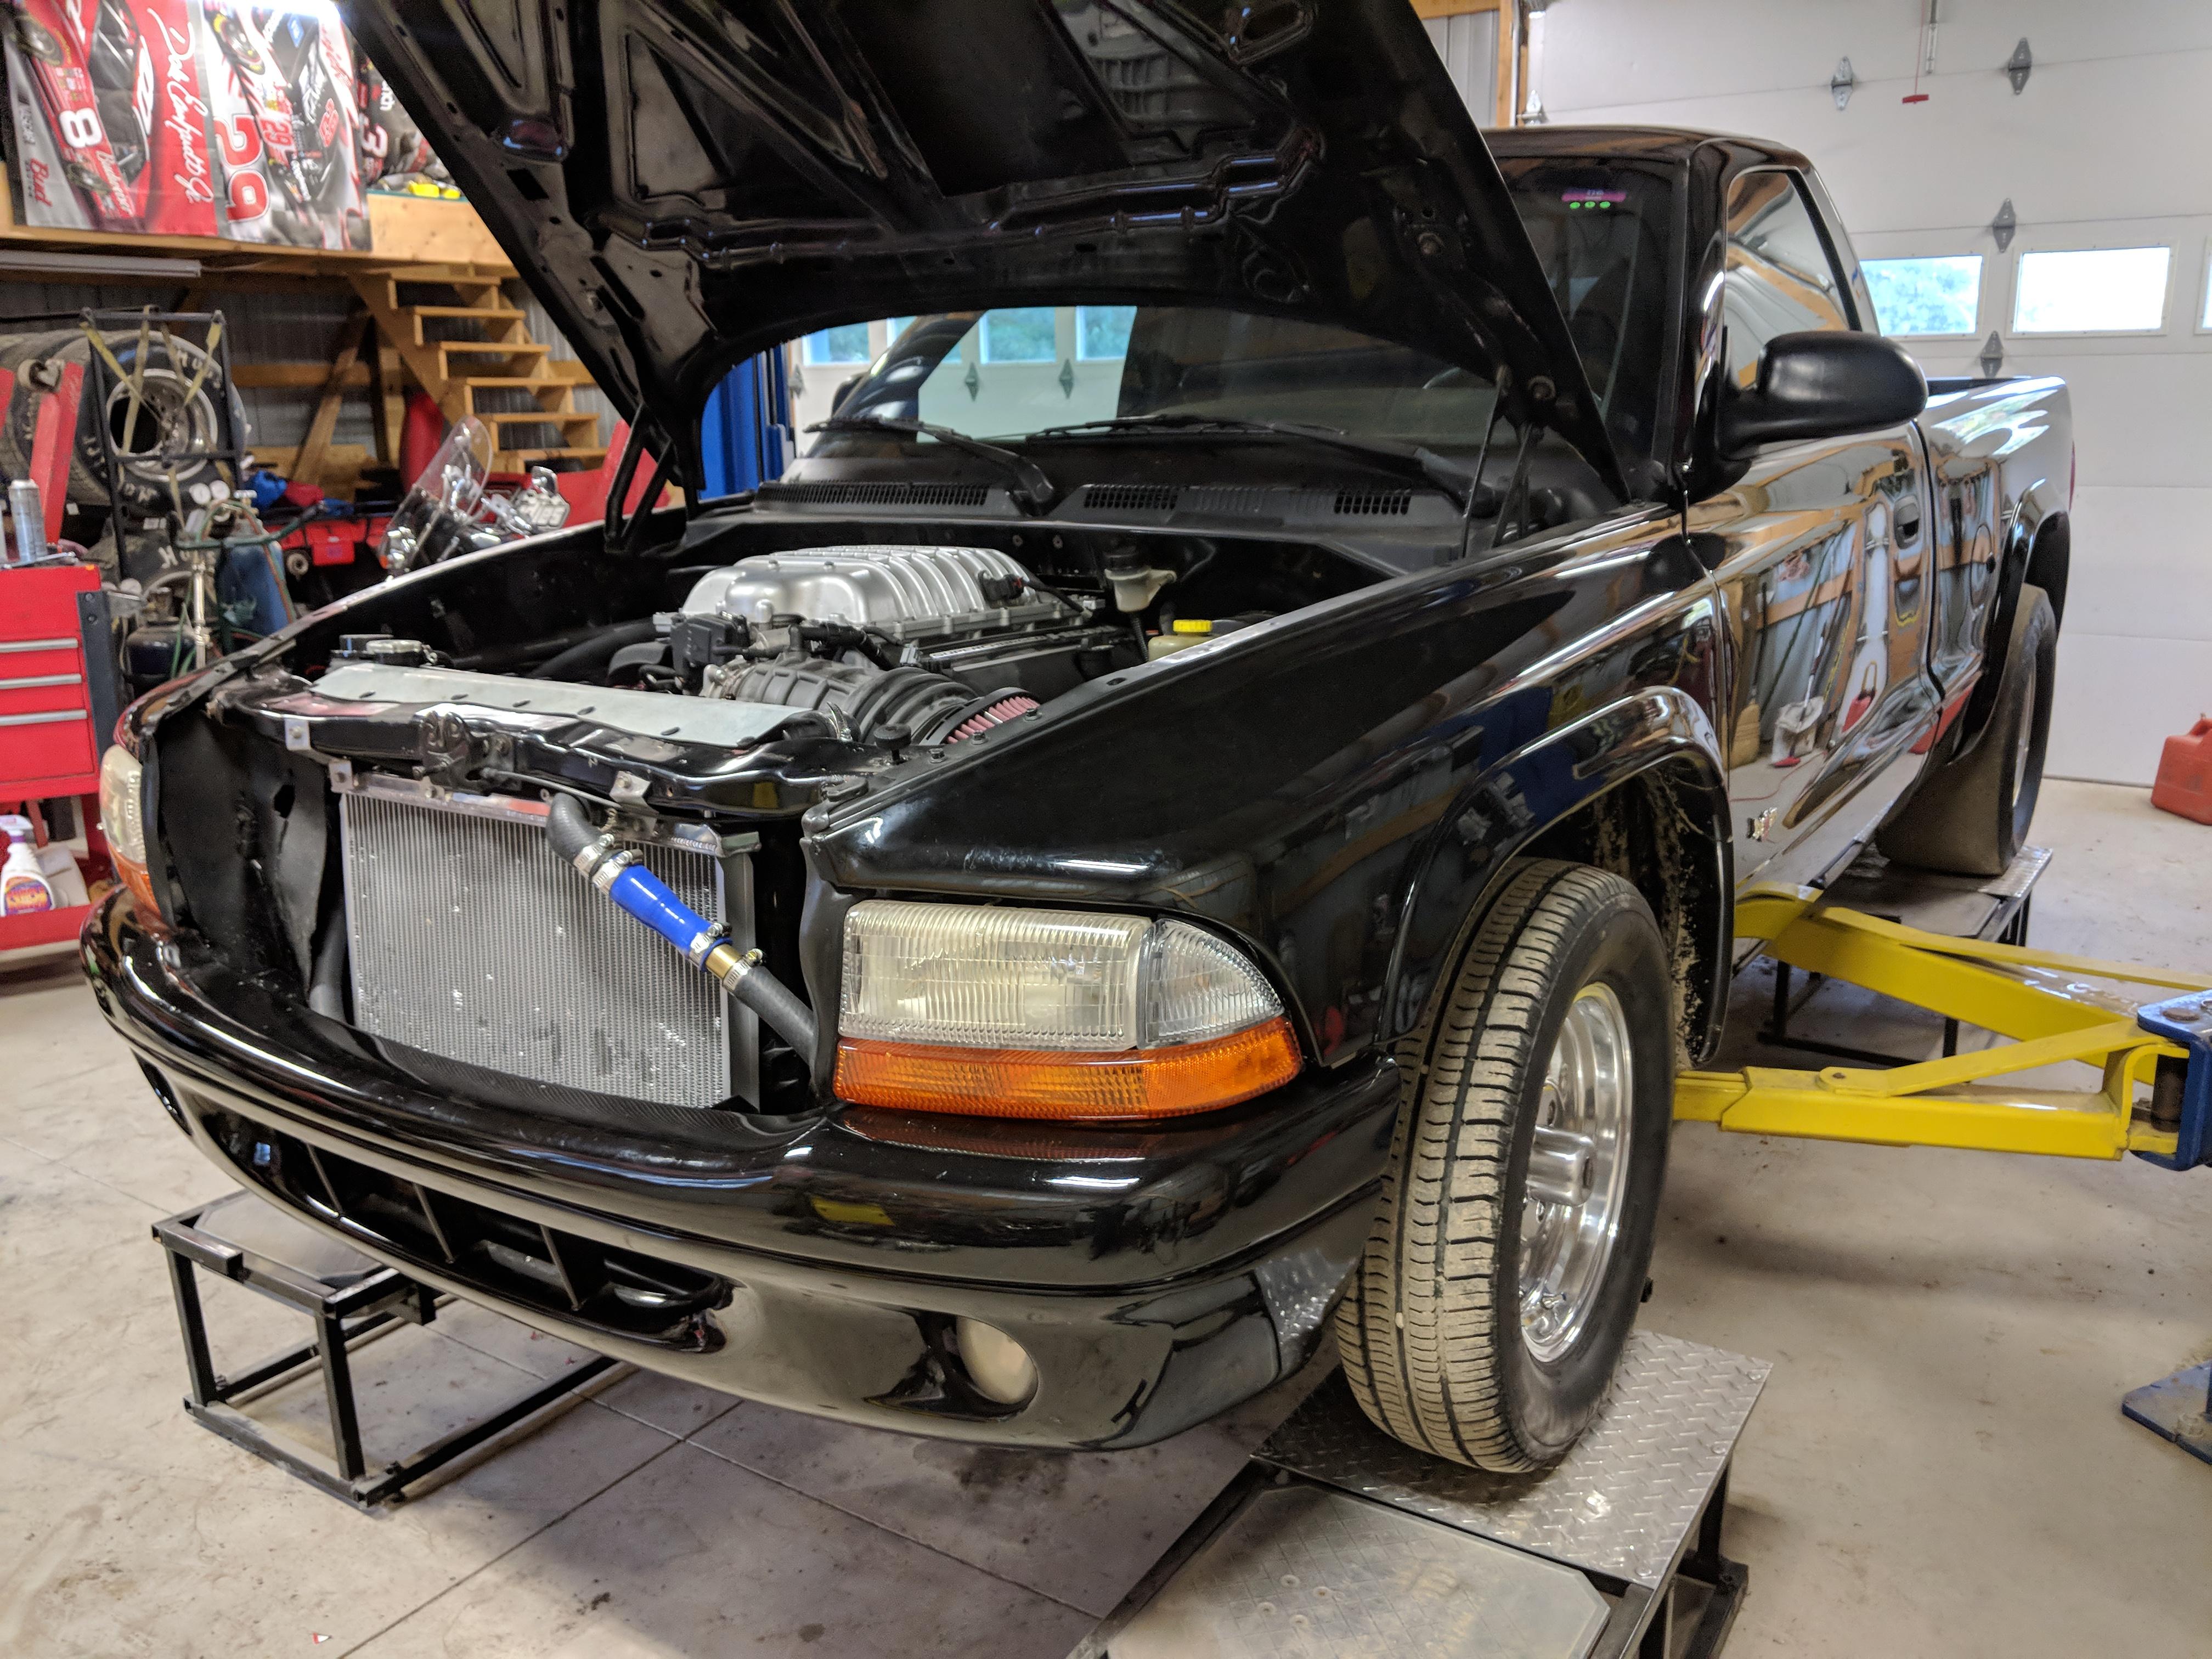 black 1998 Dodge Dakota with the hood popped